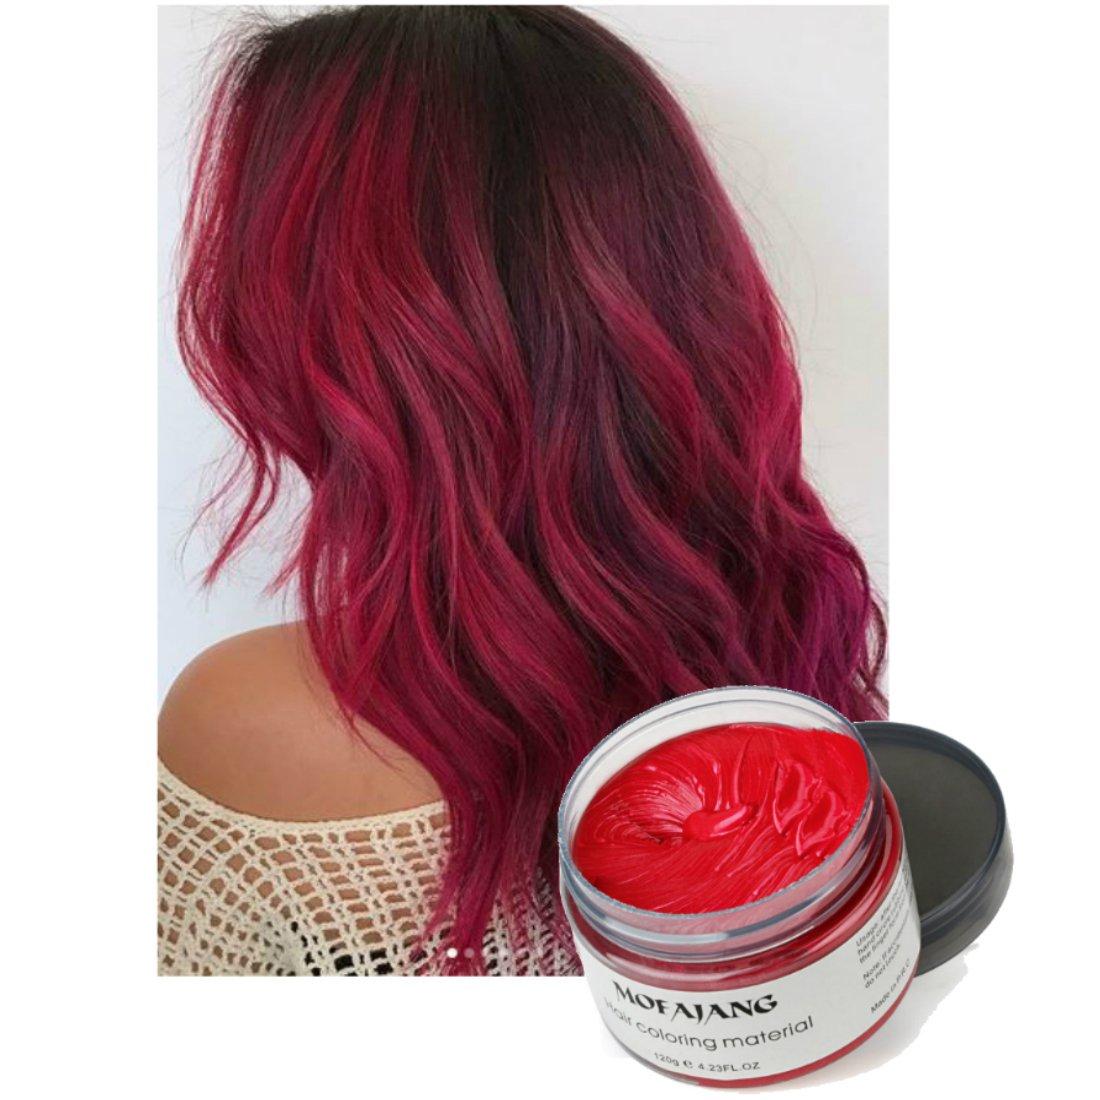 Amazon Com Mofajang Hair Wax Dye Styling Cream Mud Natural